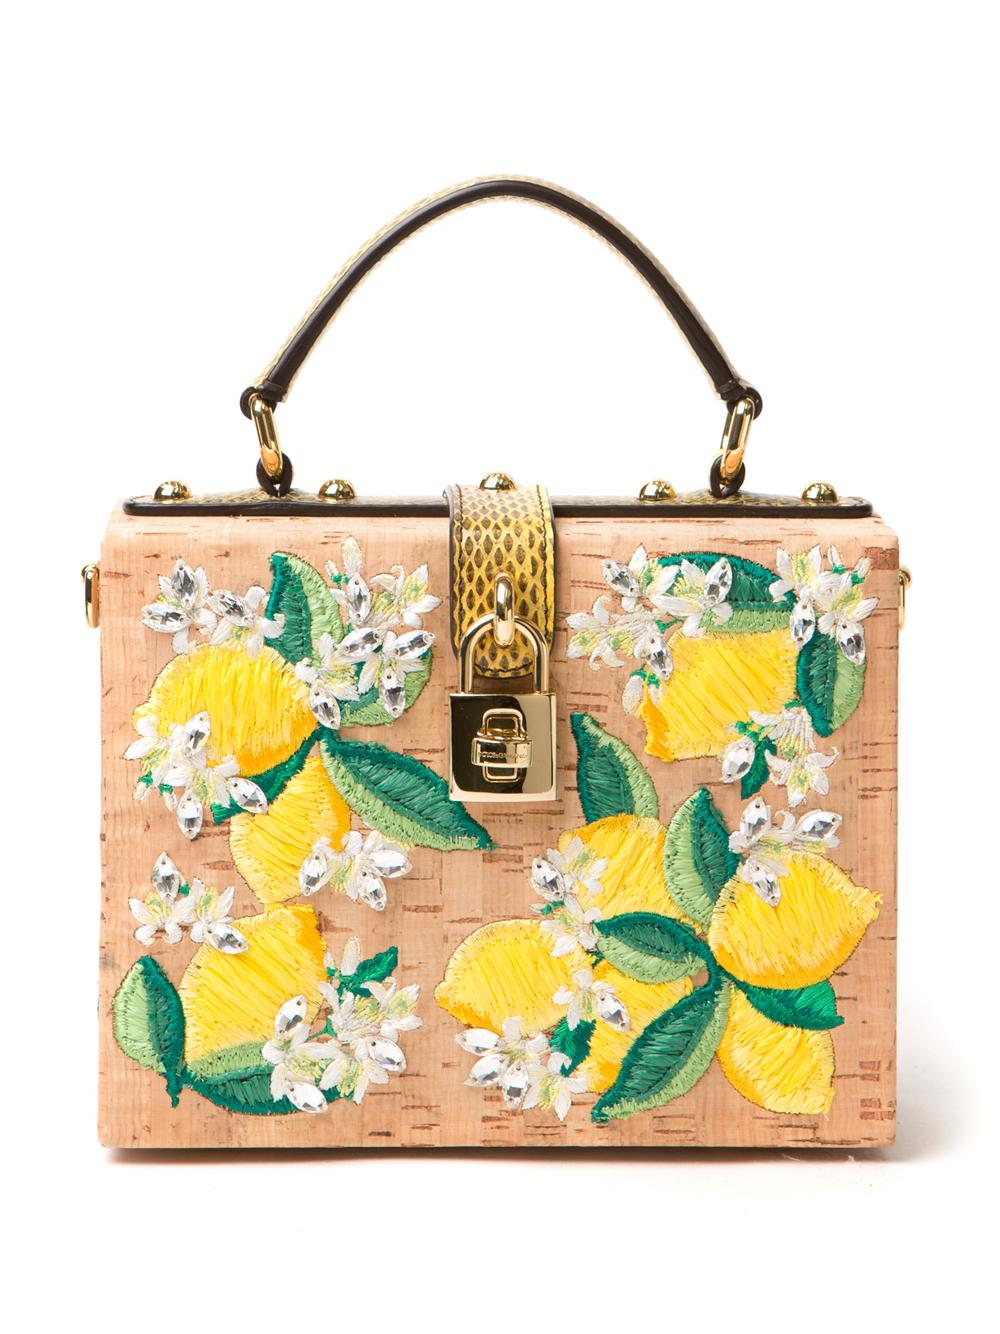 Lyst - Dolce   Gabbana Lemon Cork Tote in Yellow ae79d68187f07